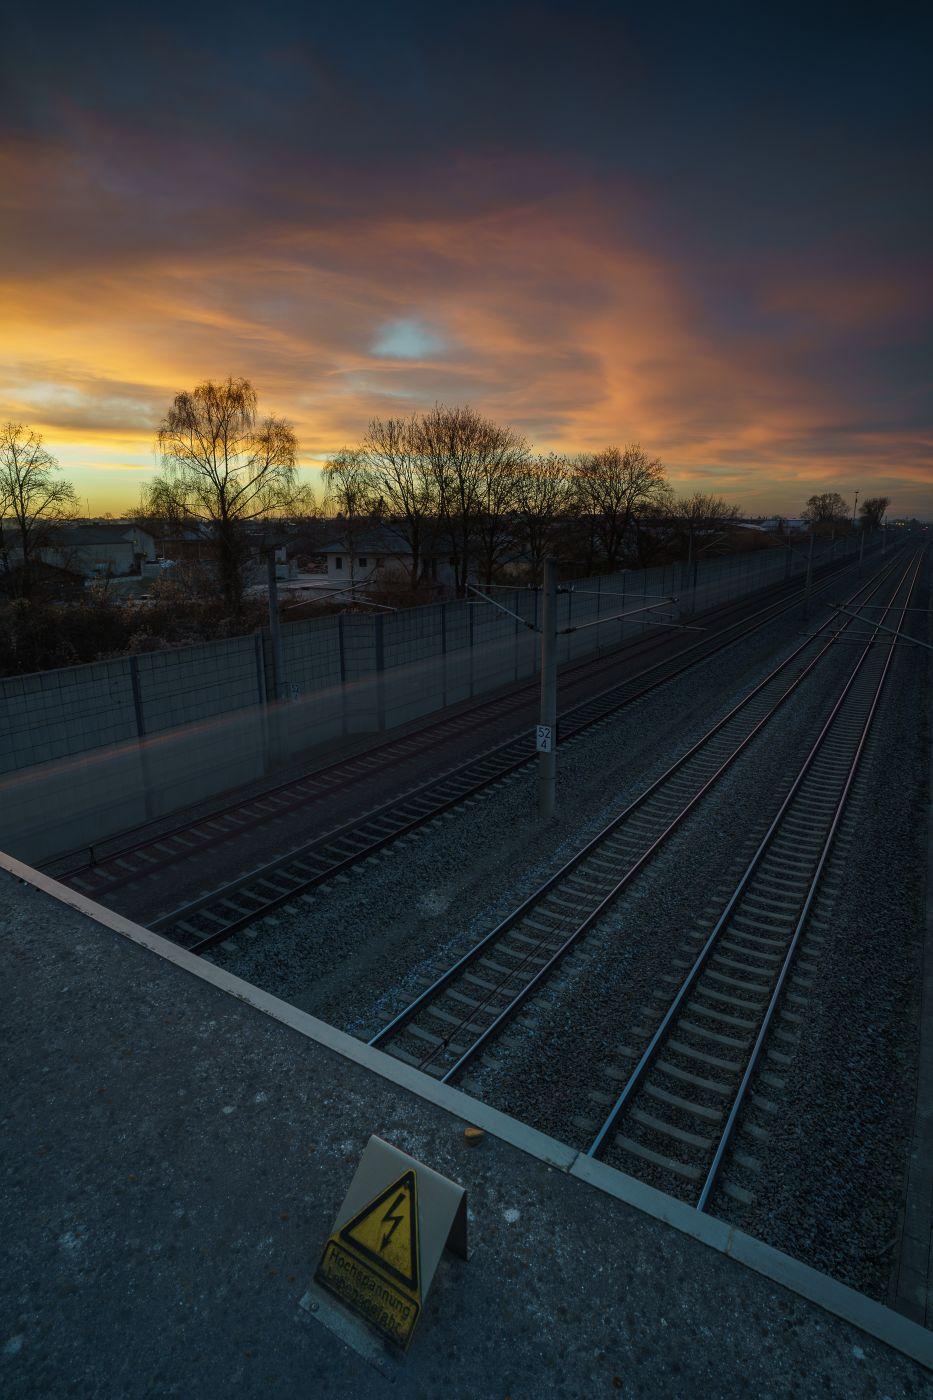 Morgenrot mit Züge, Germany